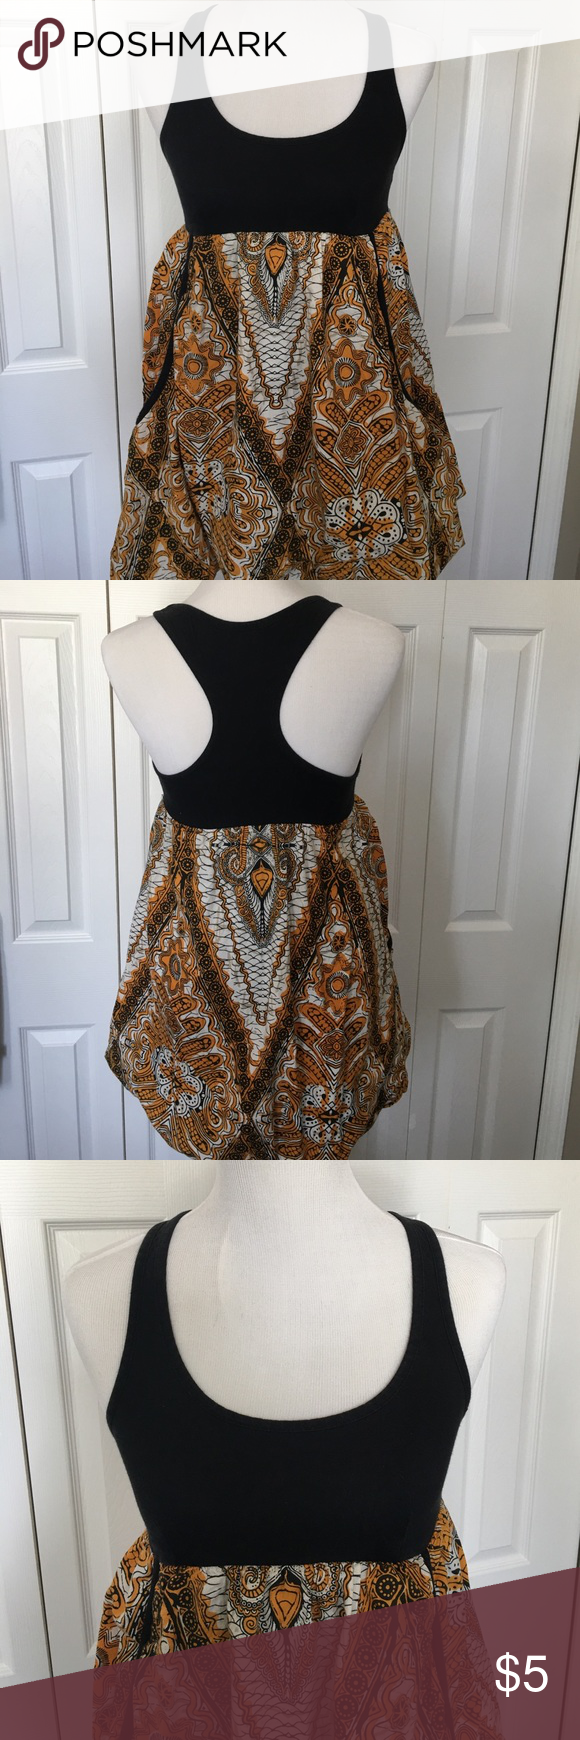 Black and Orange Patterned Sundress Super cute black with an orange pattern dress. The sides have hand pockets. Size M. 100% Cotton material. Fire Los Angeles Dresses Mini